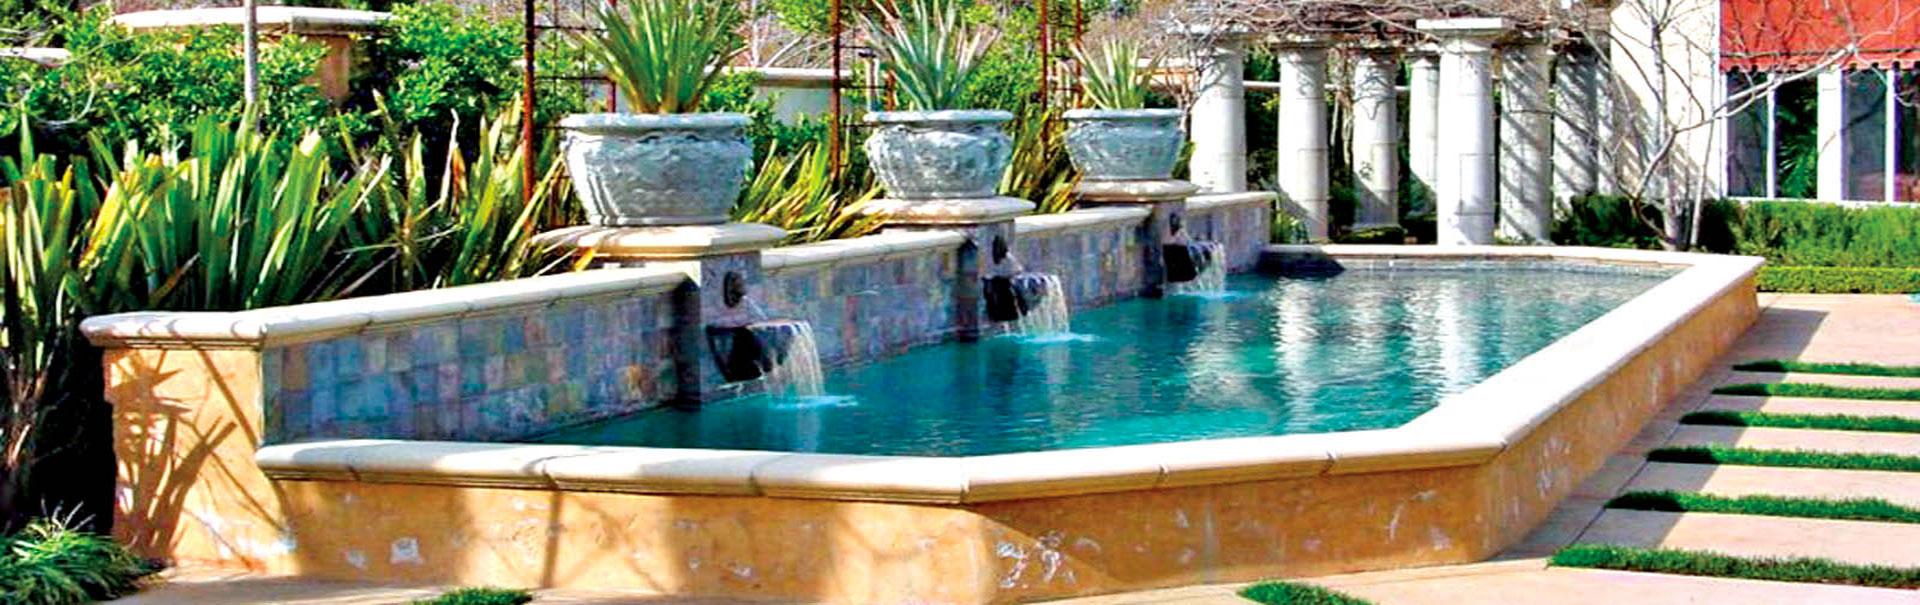 Fresno-swimming-pool